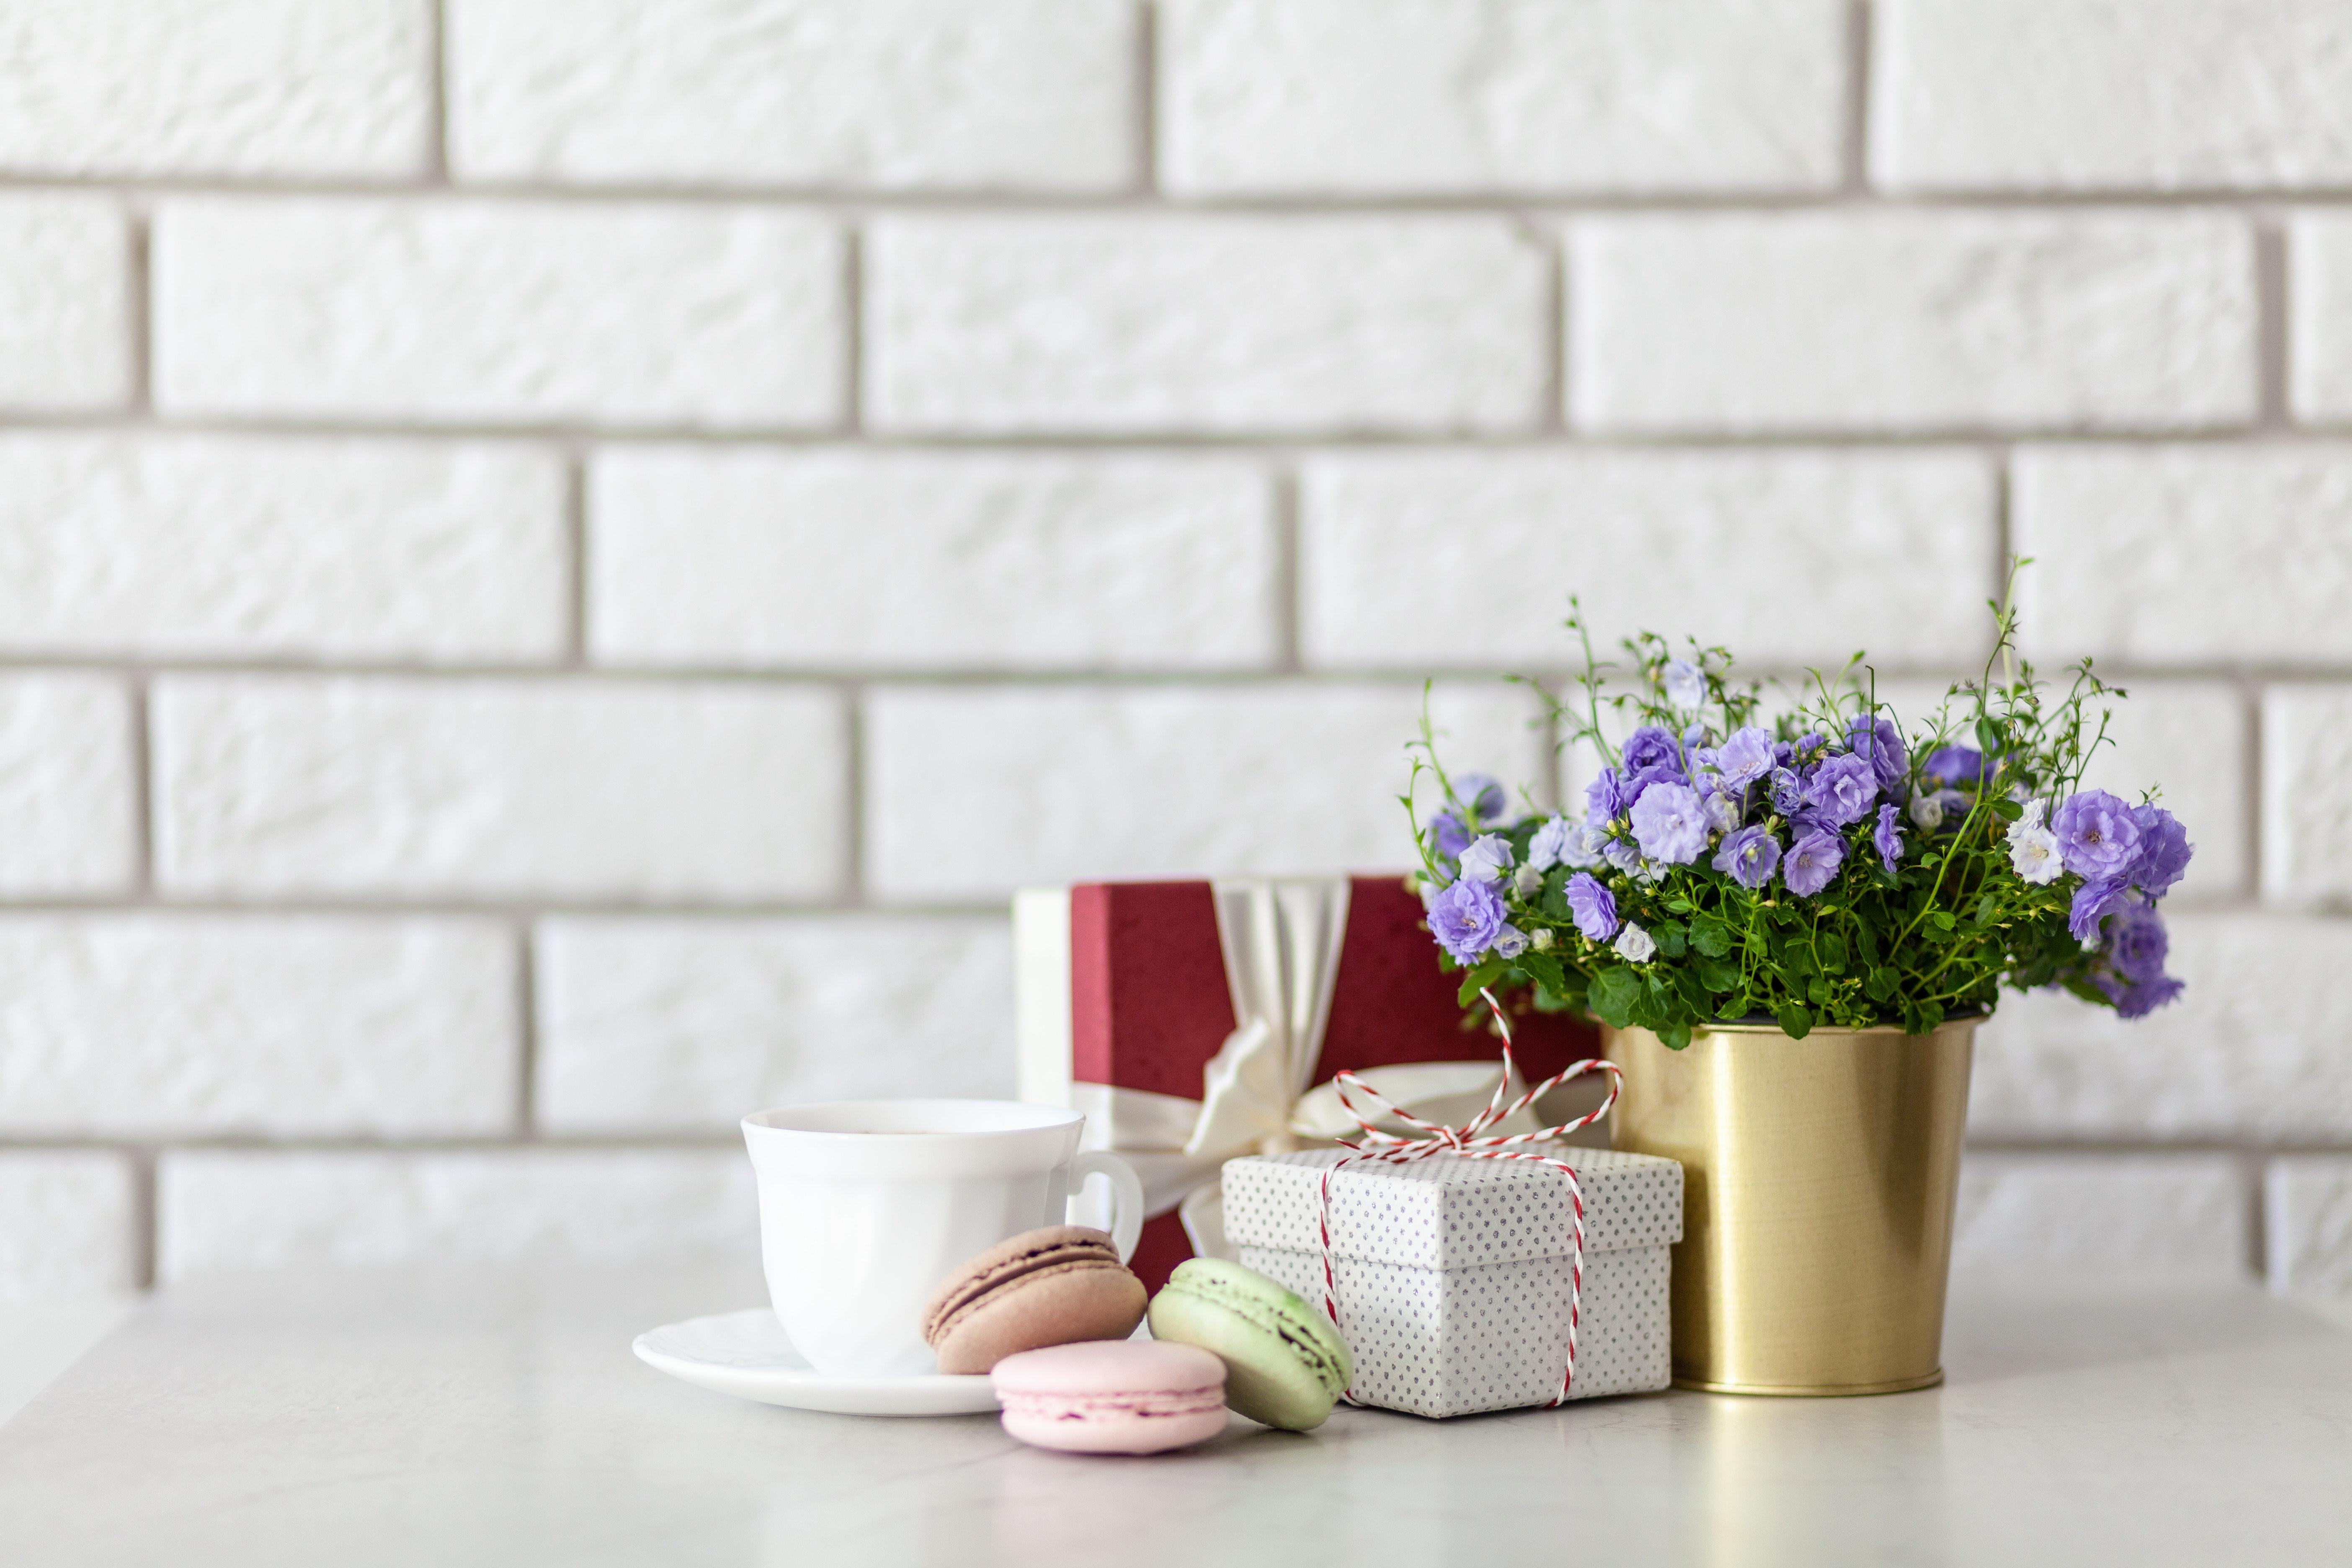 home decor trends, spring 2019, white and bright home design